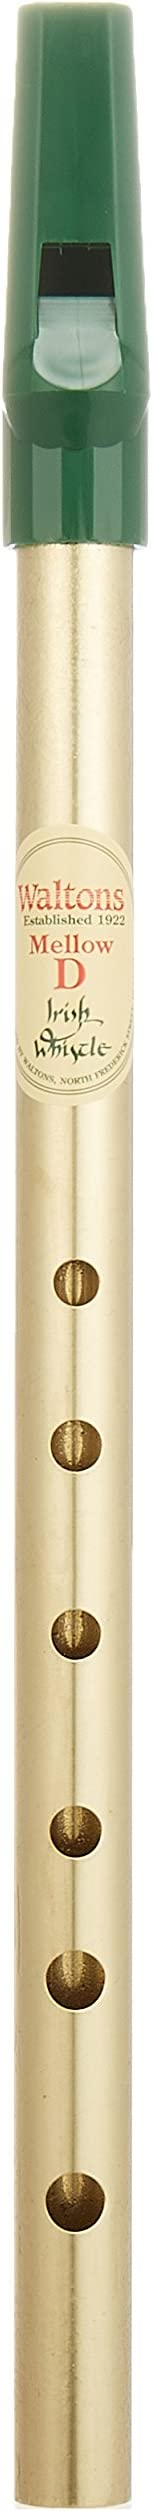 Irish Penny Whistle-Key of D/Misc. Supply